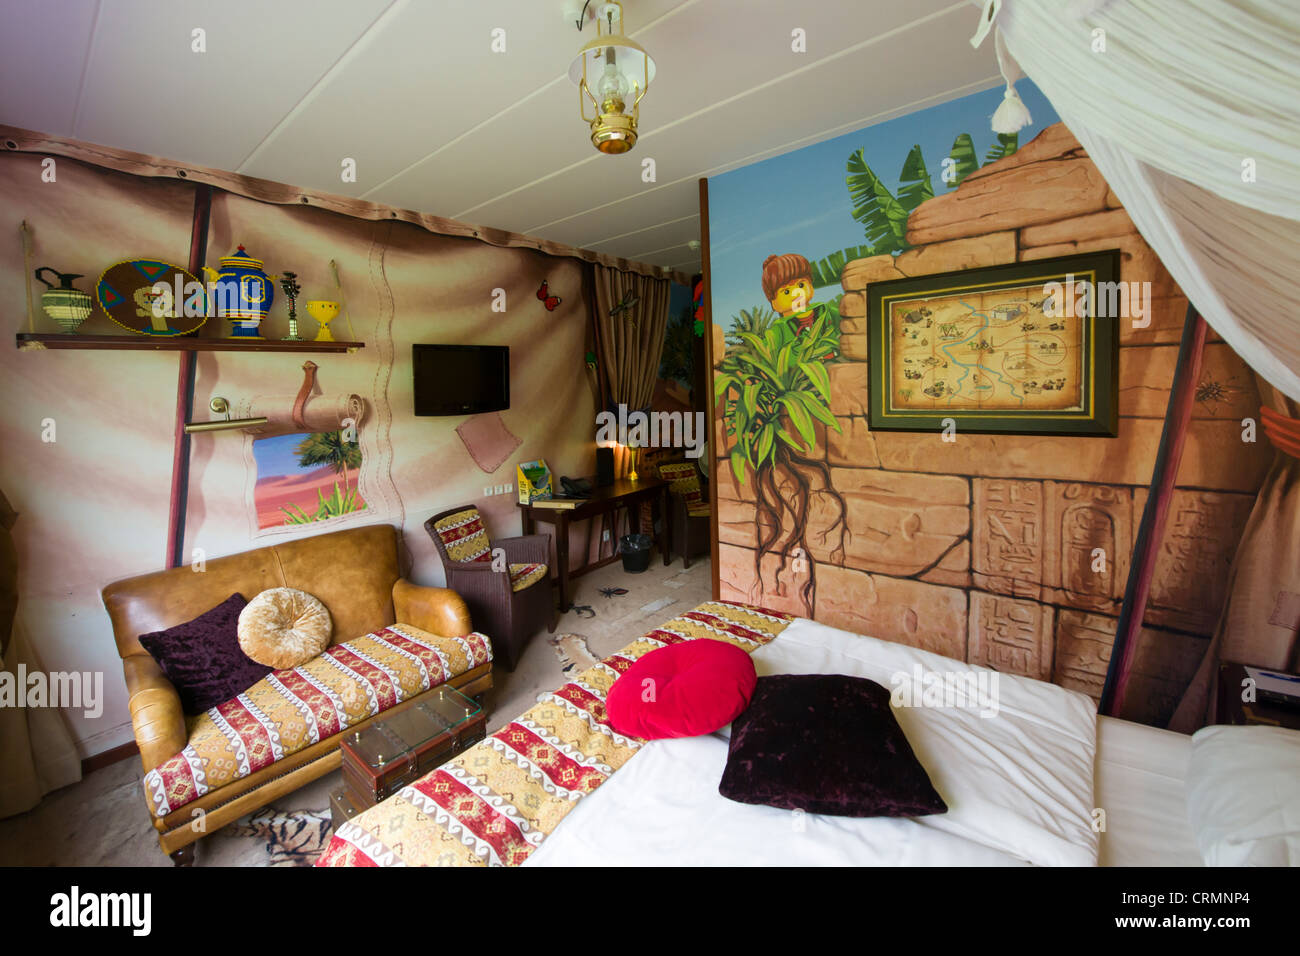 Interior Of Adventure Themed Room At The Hotel Legoland Legoland Billund Denmark Stock Photo Alamy